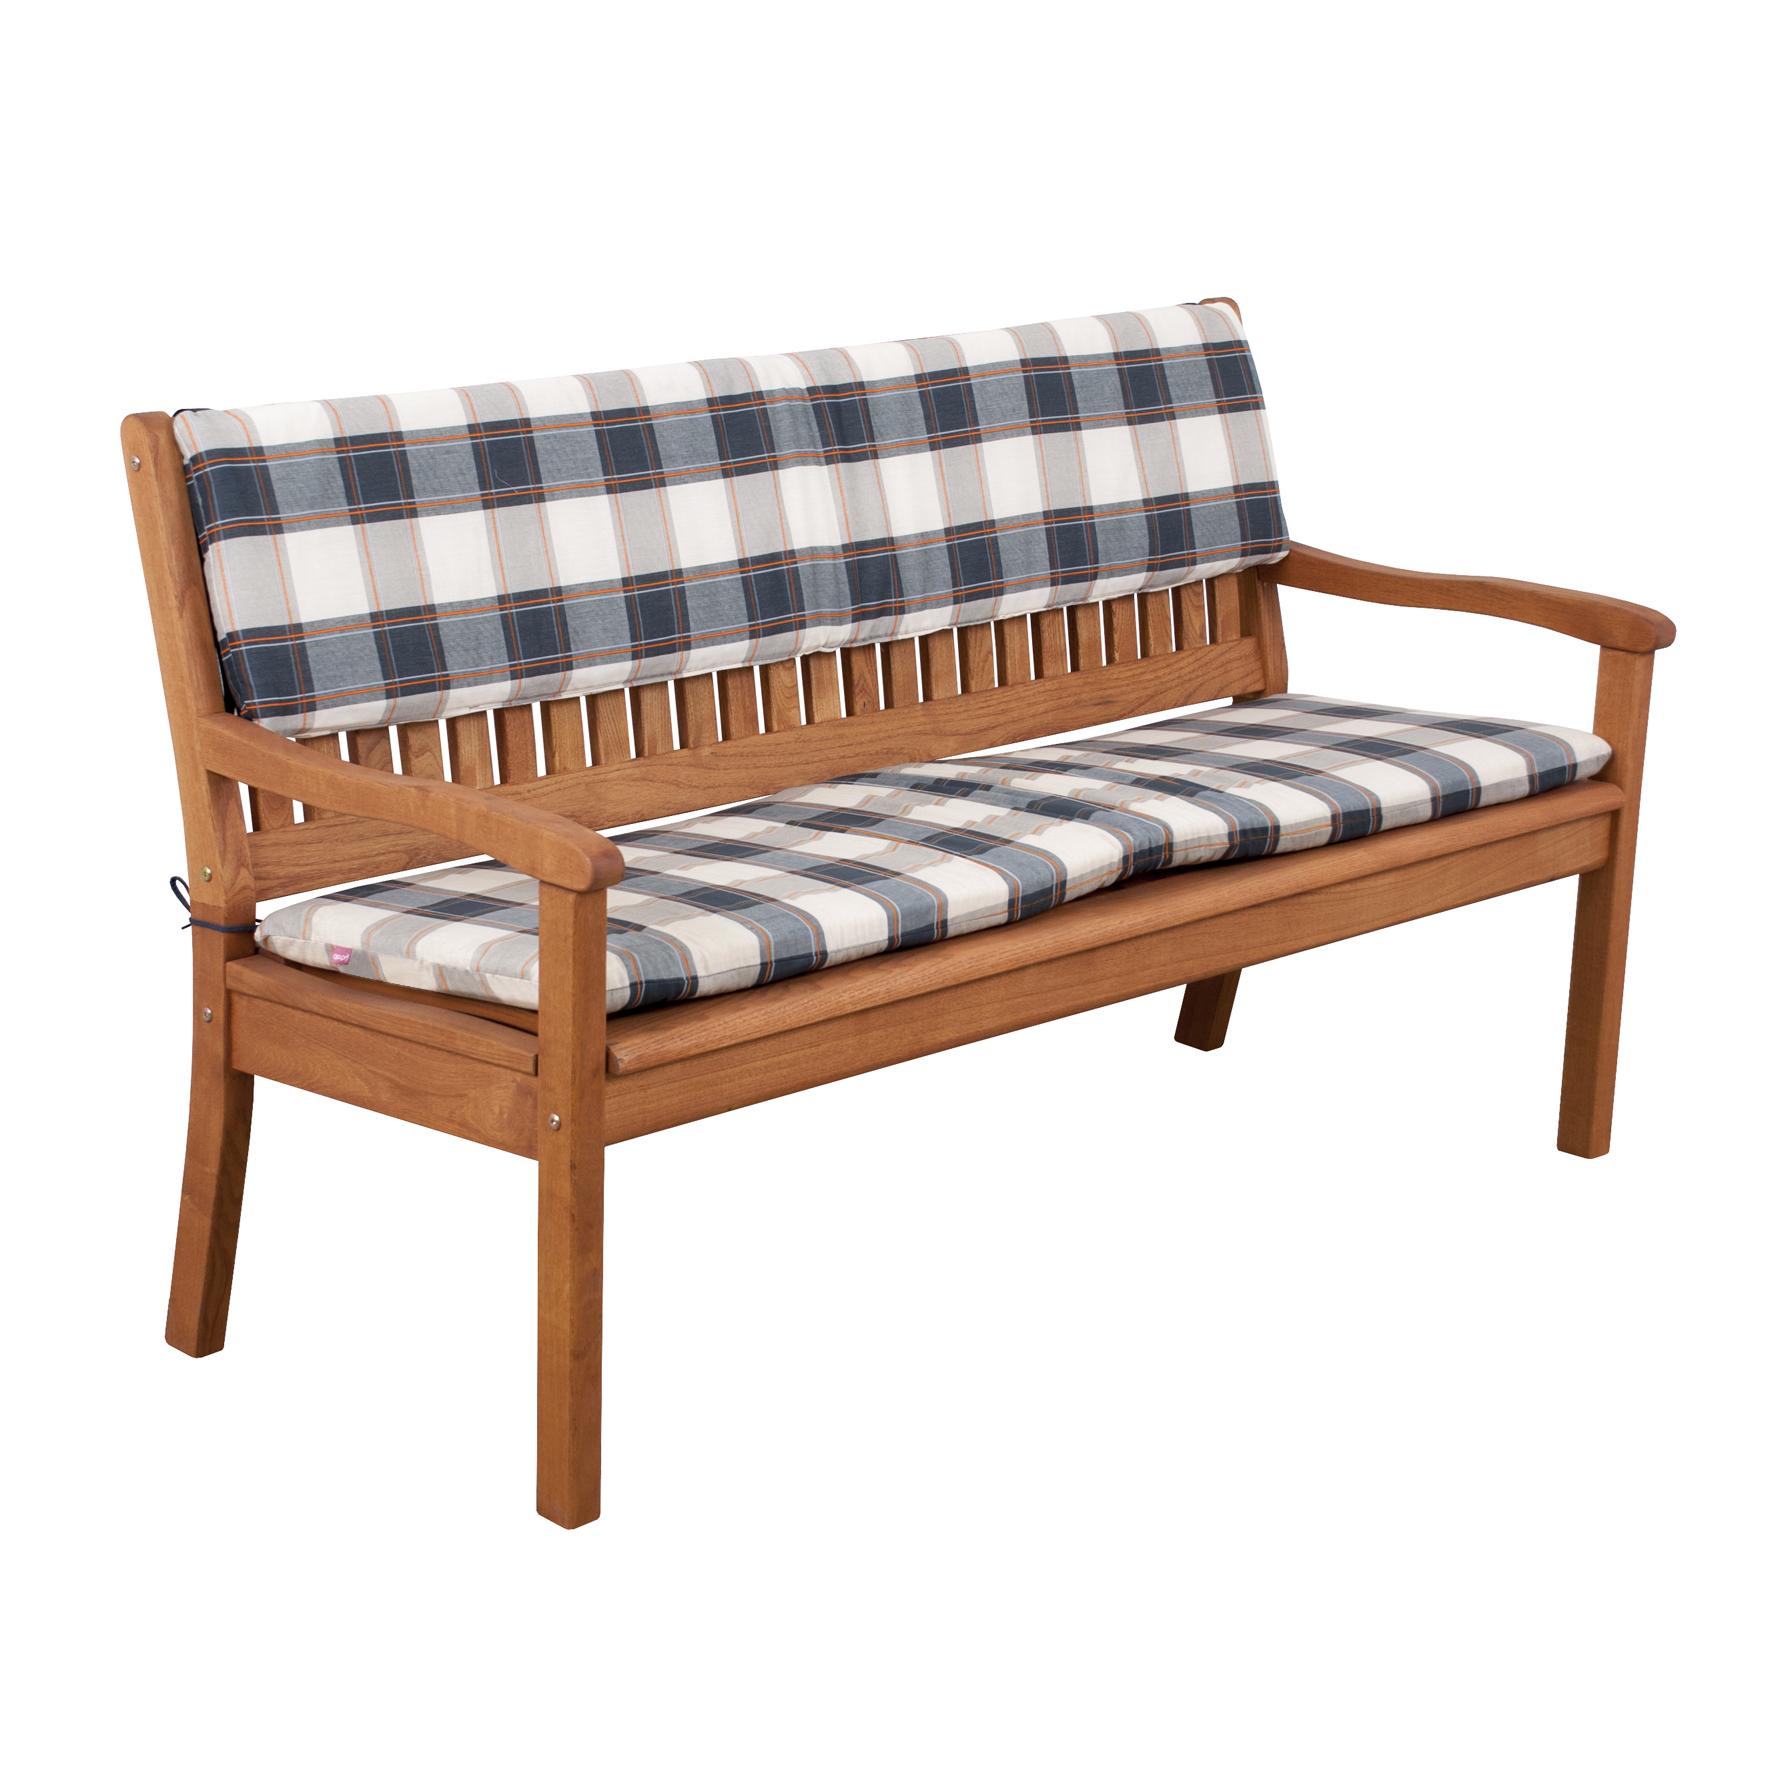 Opěrka na lavici 3 sedadla 150x30cm